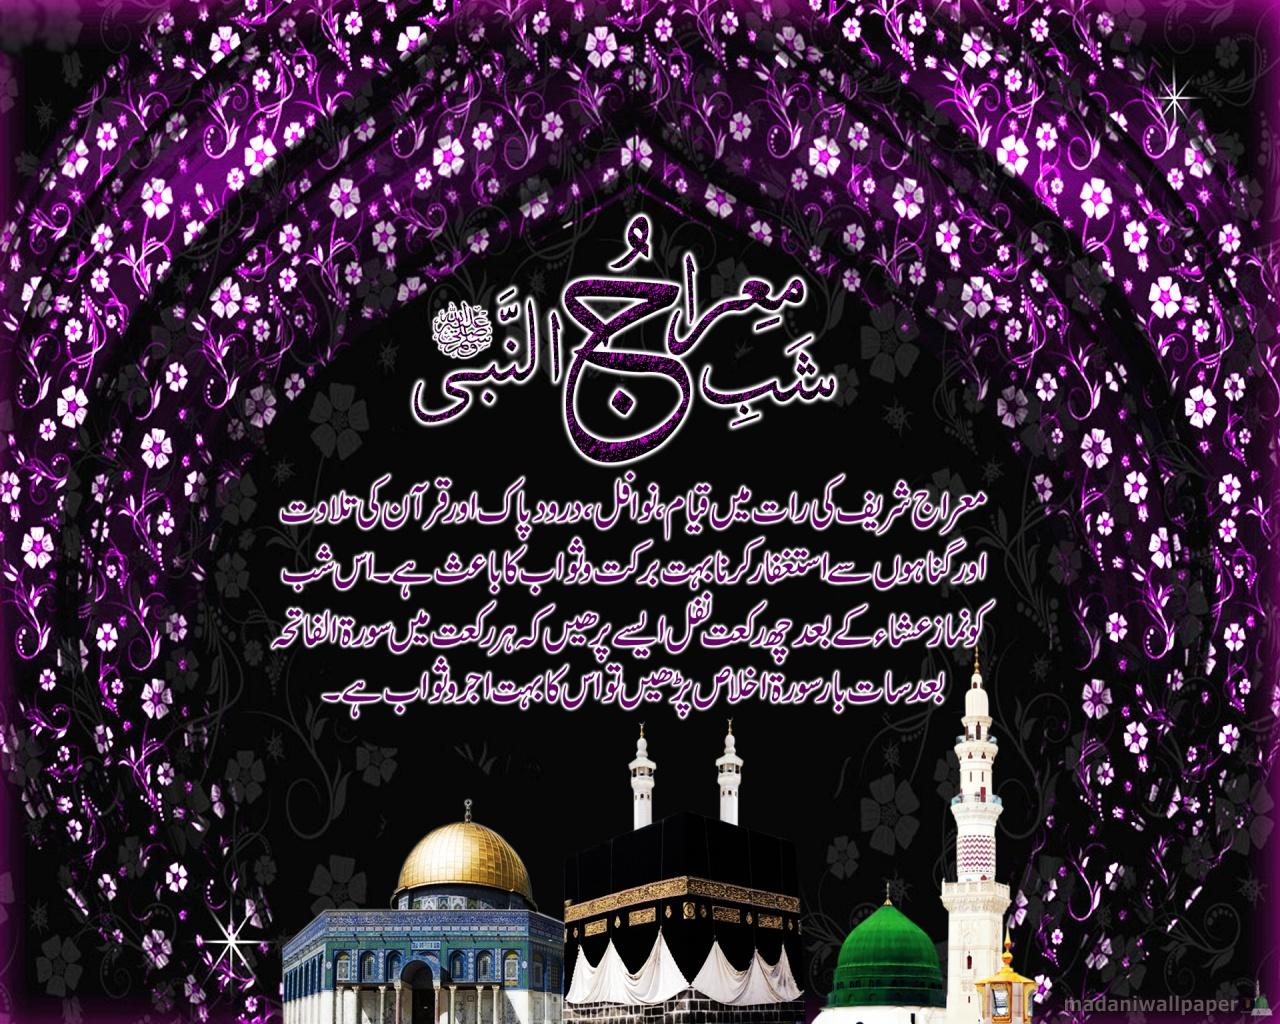 The Kitaab Shab E Meraj Mubarak Wallpapers Full Hd Pic Images Free